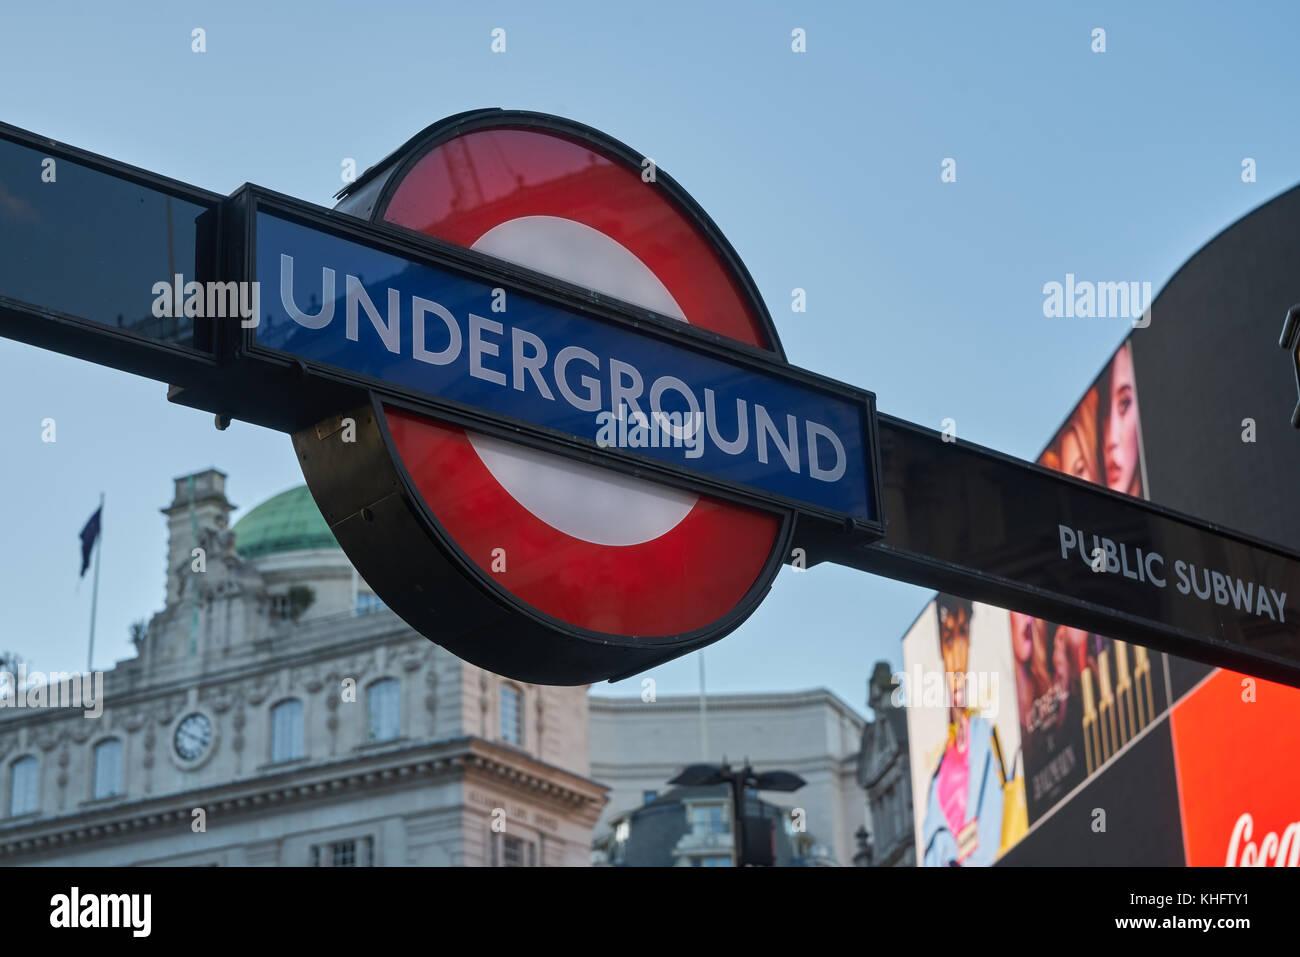 picadily circus london - Stock Image